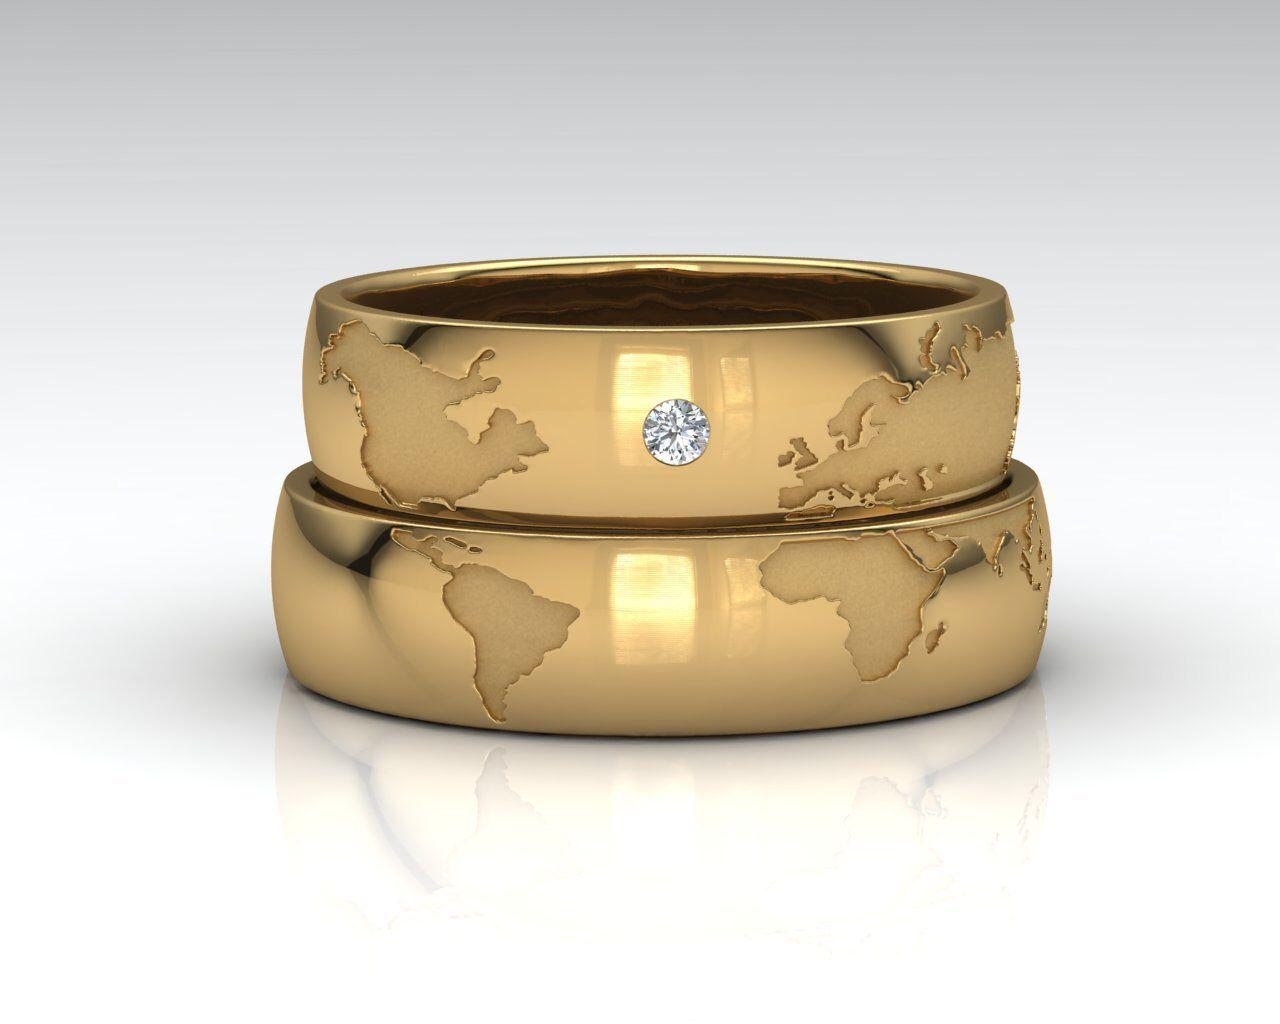 Anillos mapamundi, oro amarillo 18k, diamante, anillos compromiso, boda, aniversario, anillo hombre, anillo mujer, free worldwide shipping